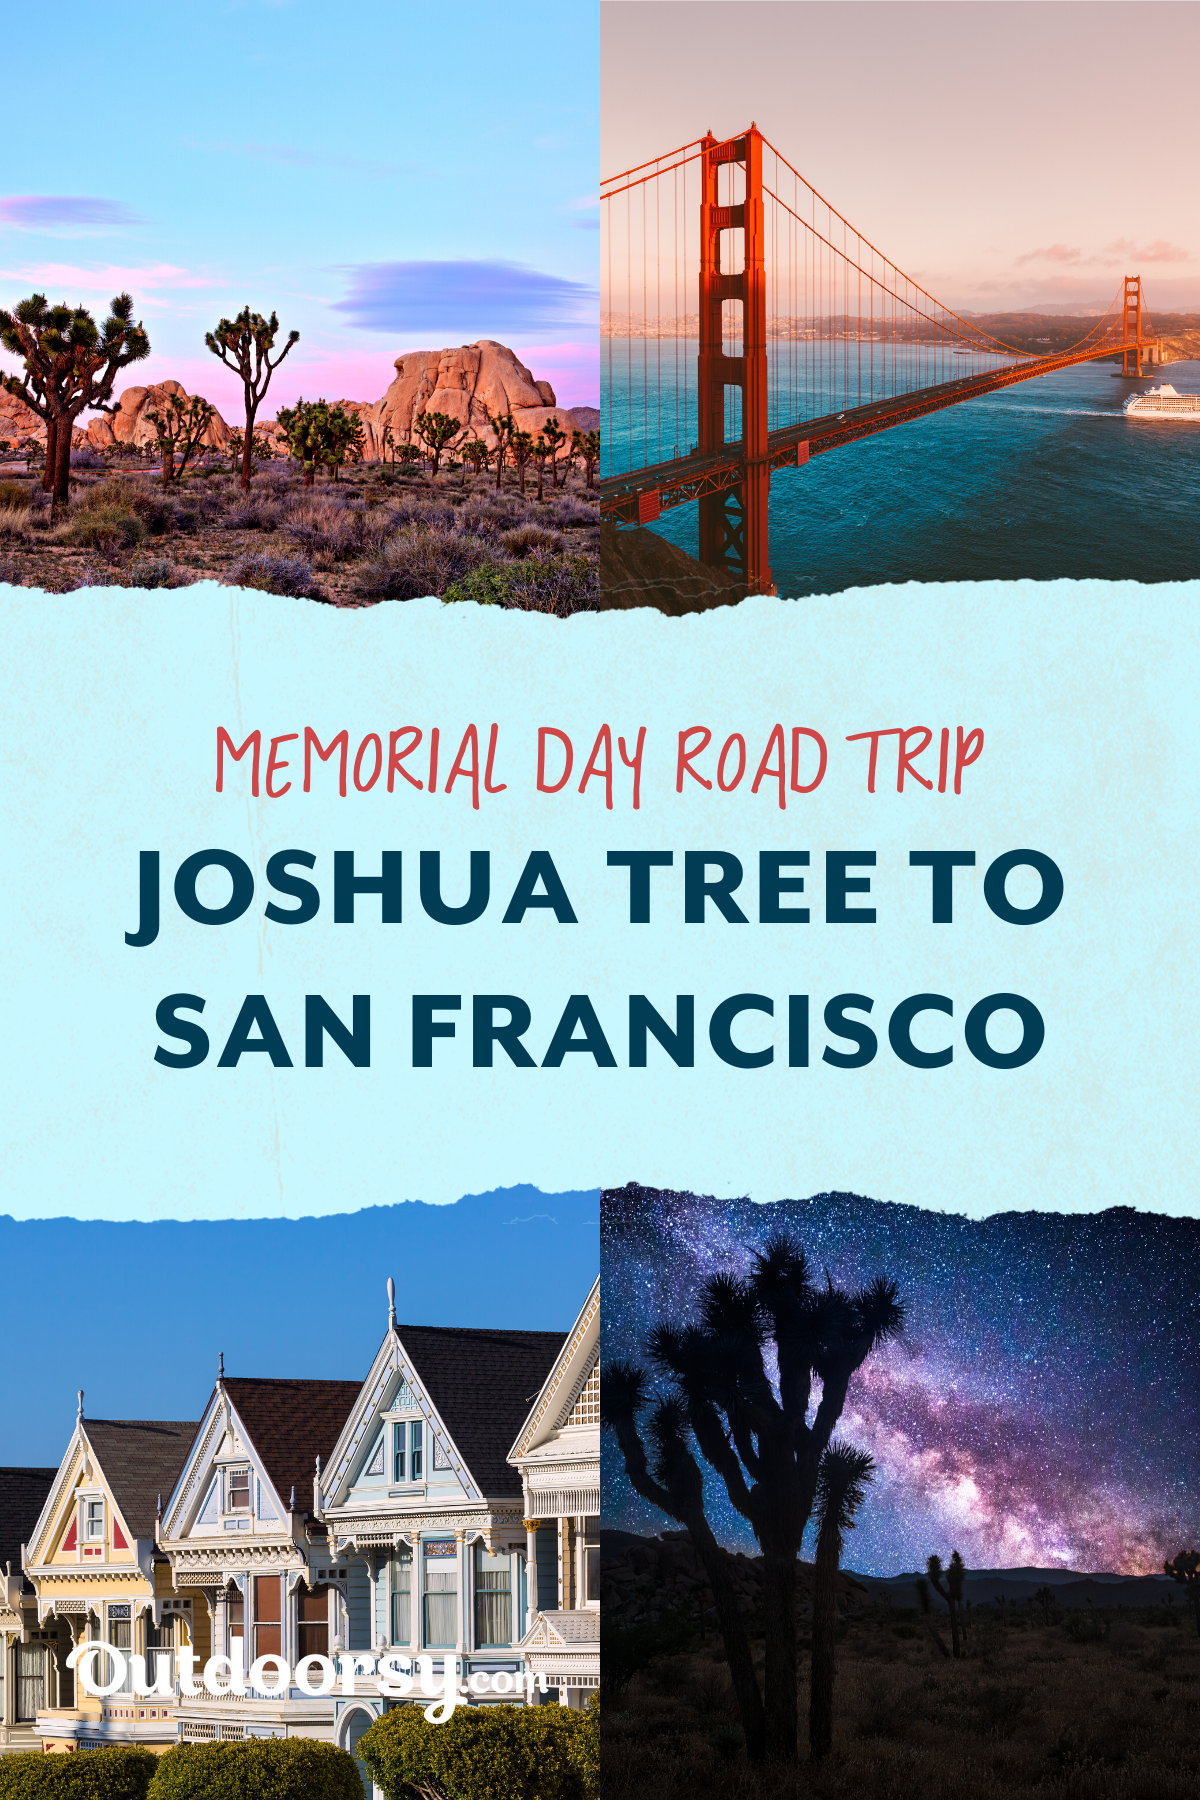 Joshua Tree To San Francisco Road Trip Outdoorsy In 2020 San Francisco Road Trip Road Trip Trip